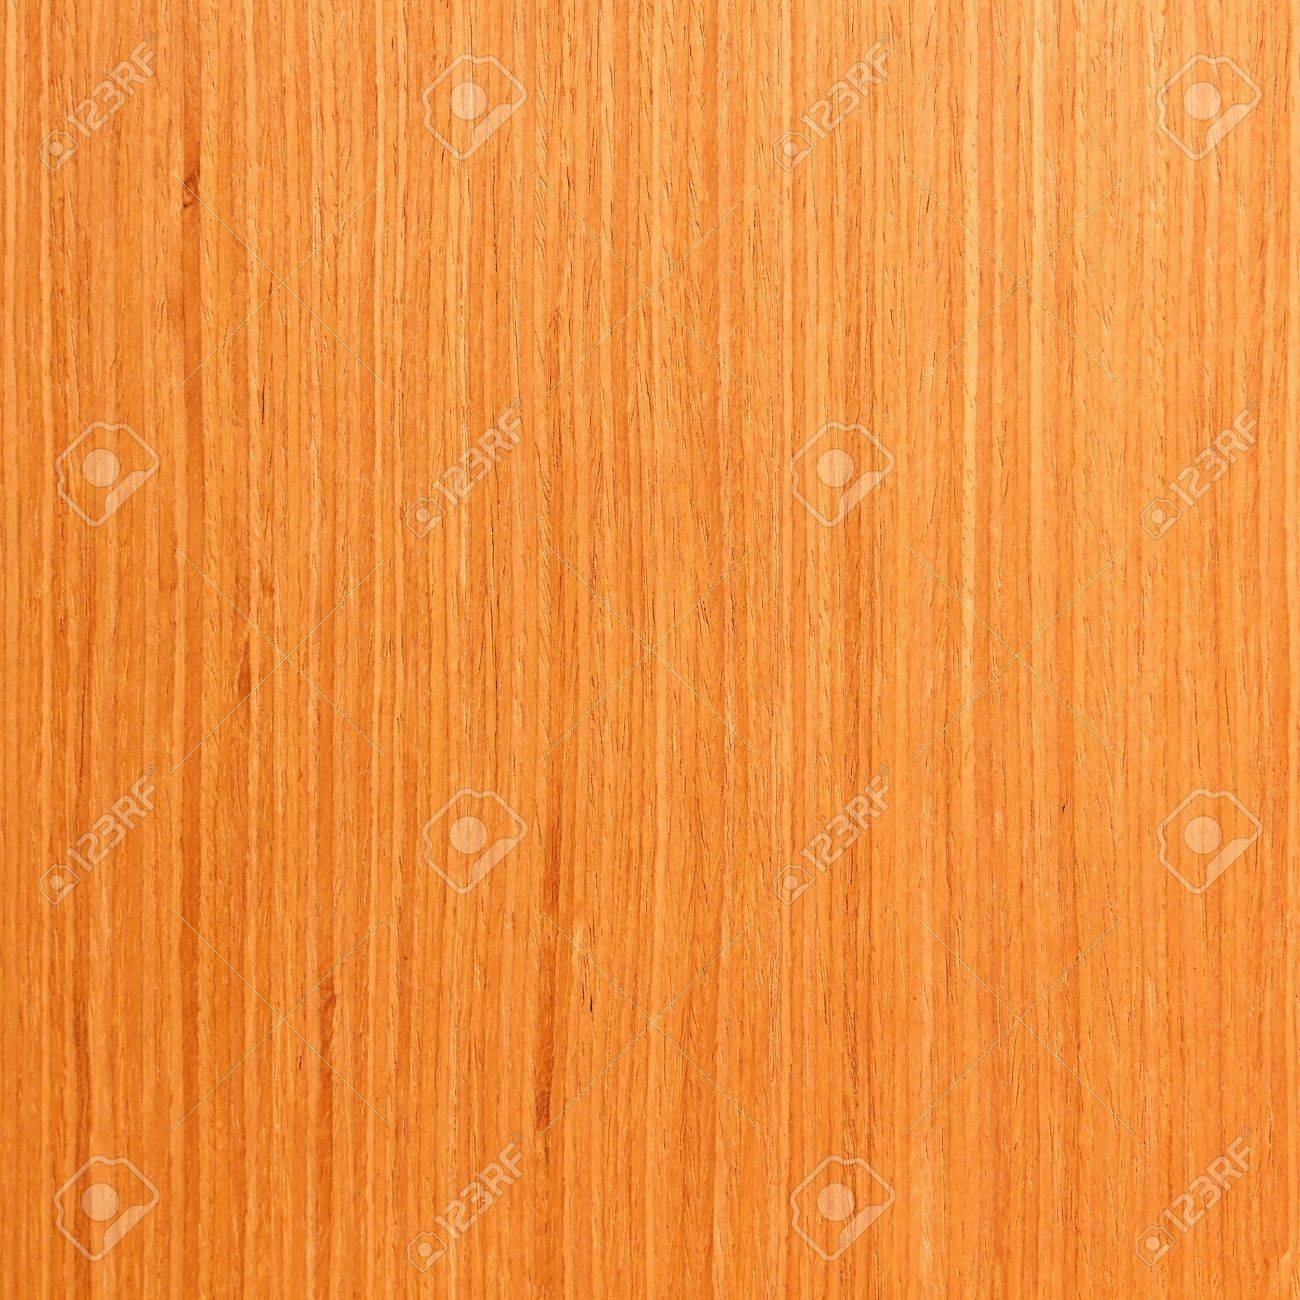 Laminat textur hd  Laminat Textur Hd | Haus Deko Ideen